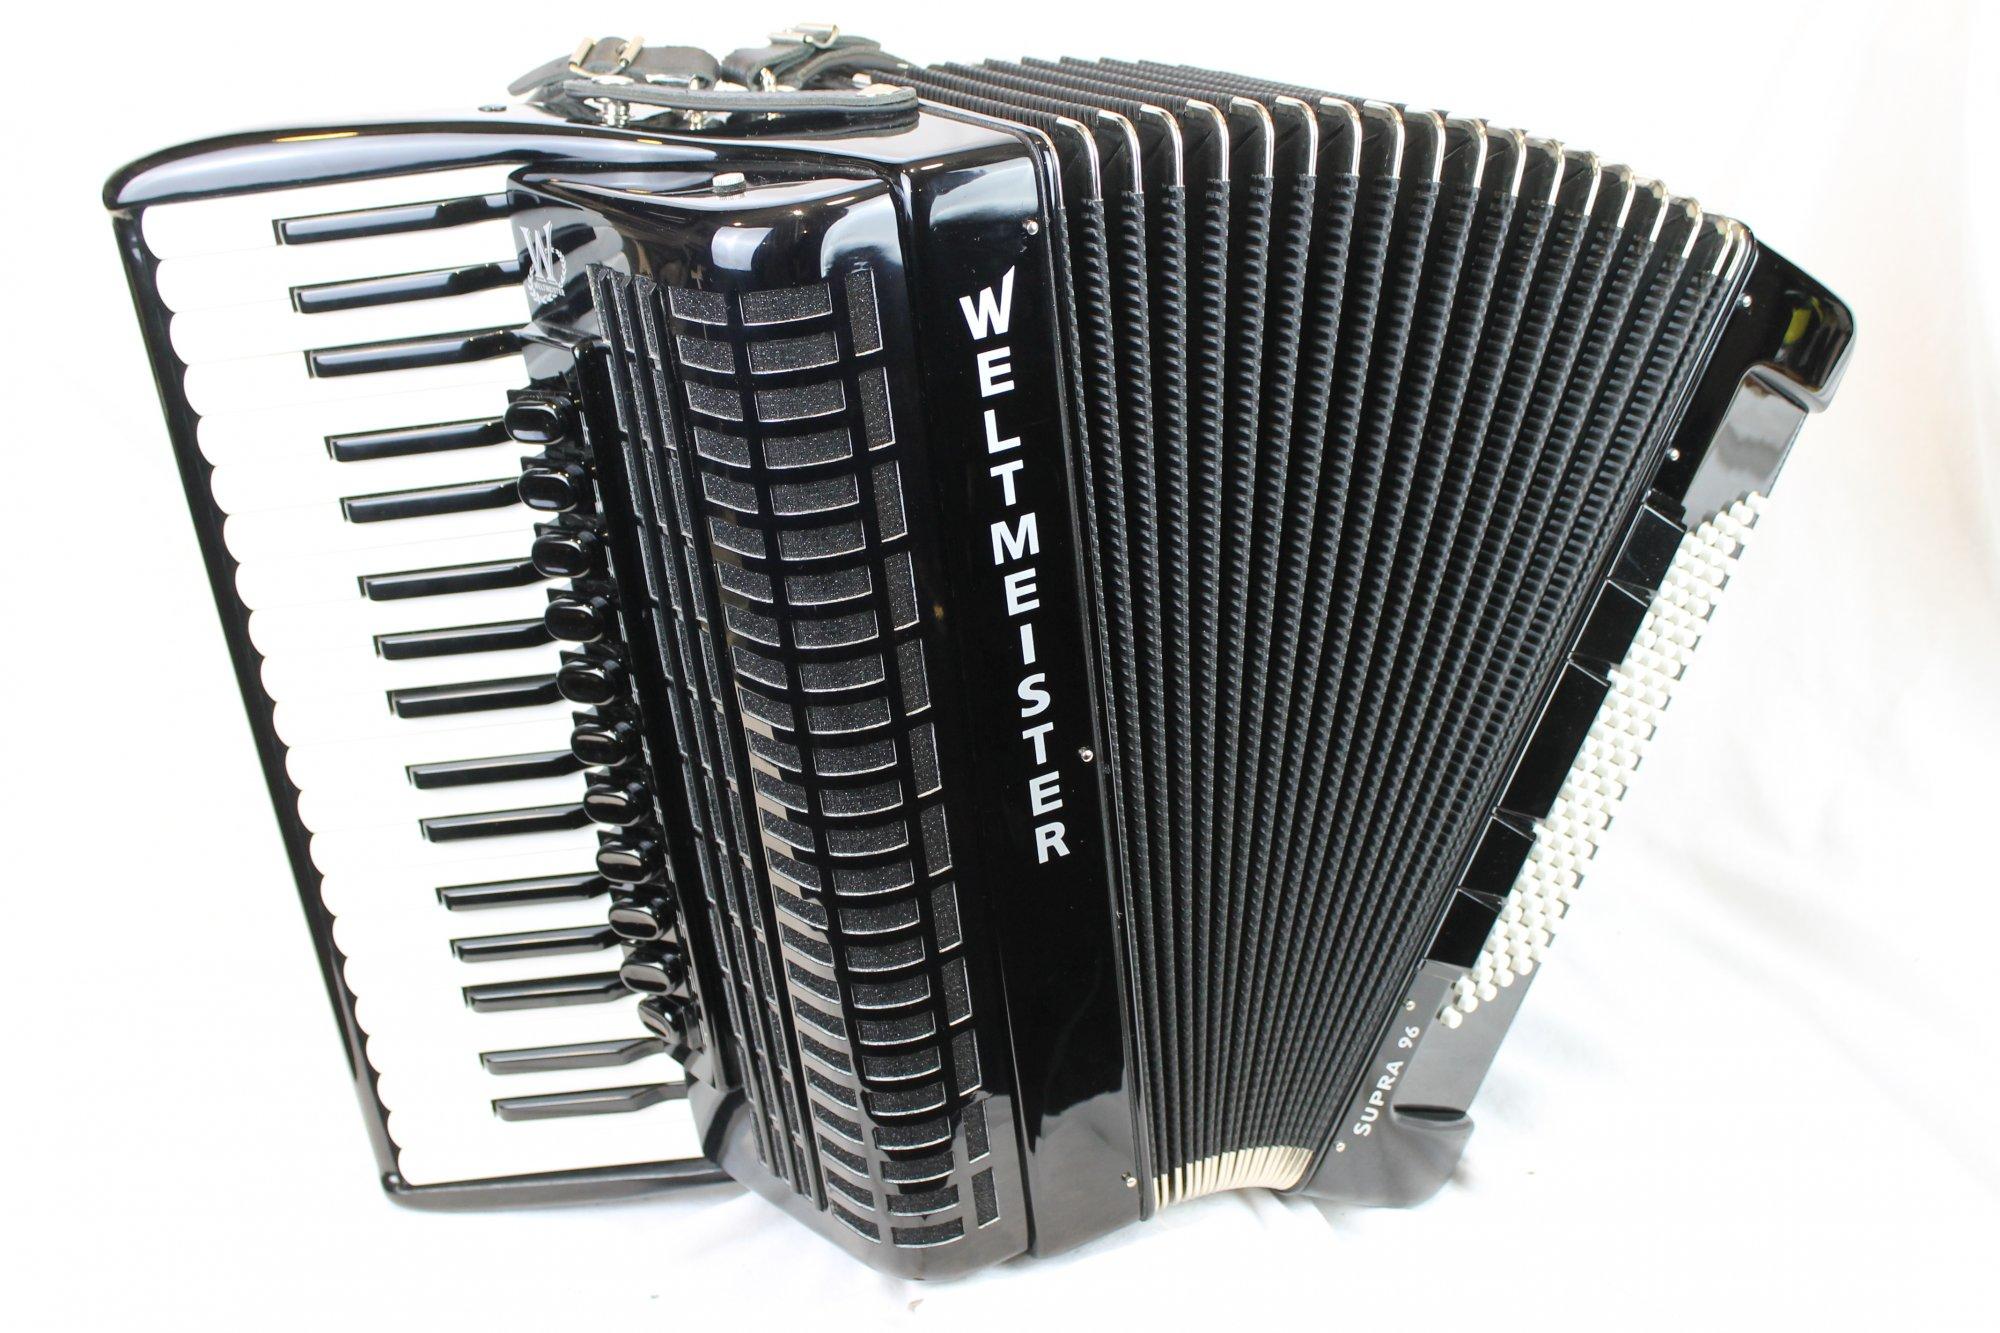 NEW Black Weltmeister Supra Tone Chambered Piano Accordion LMMH 37 96